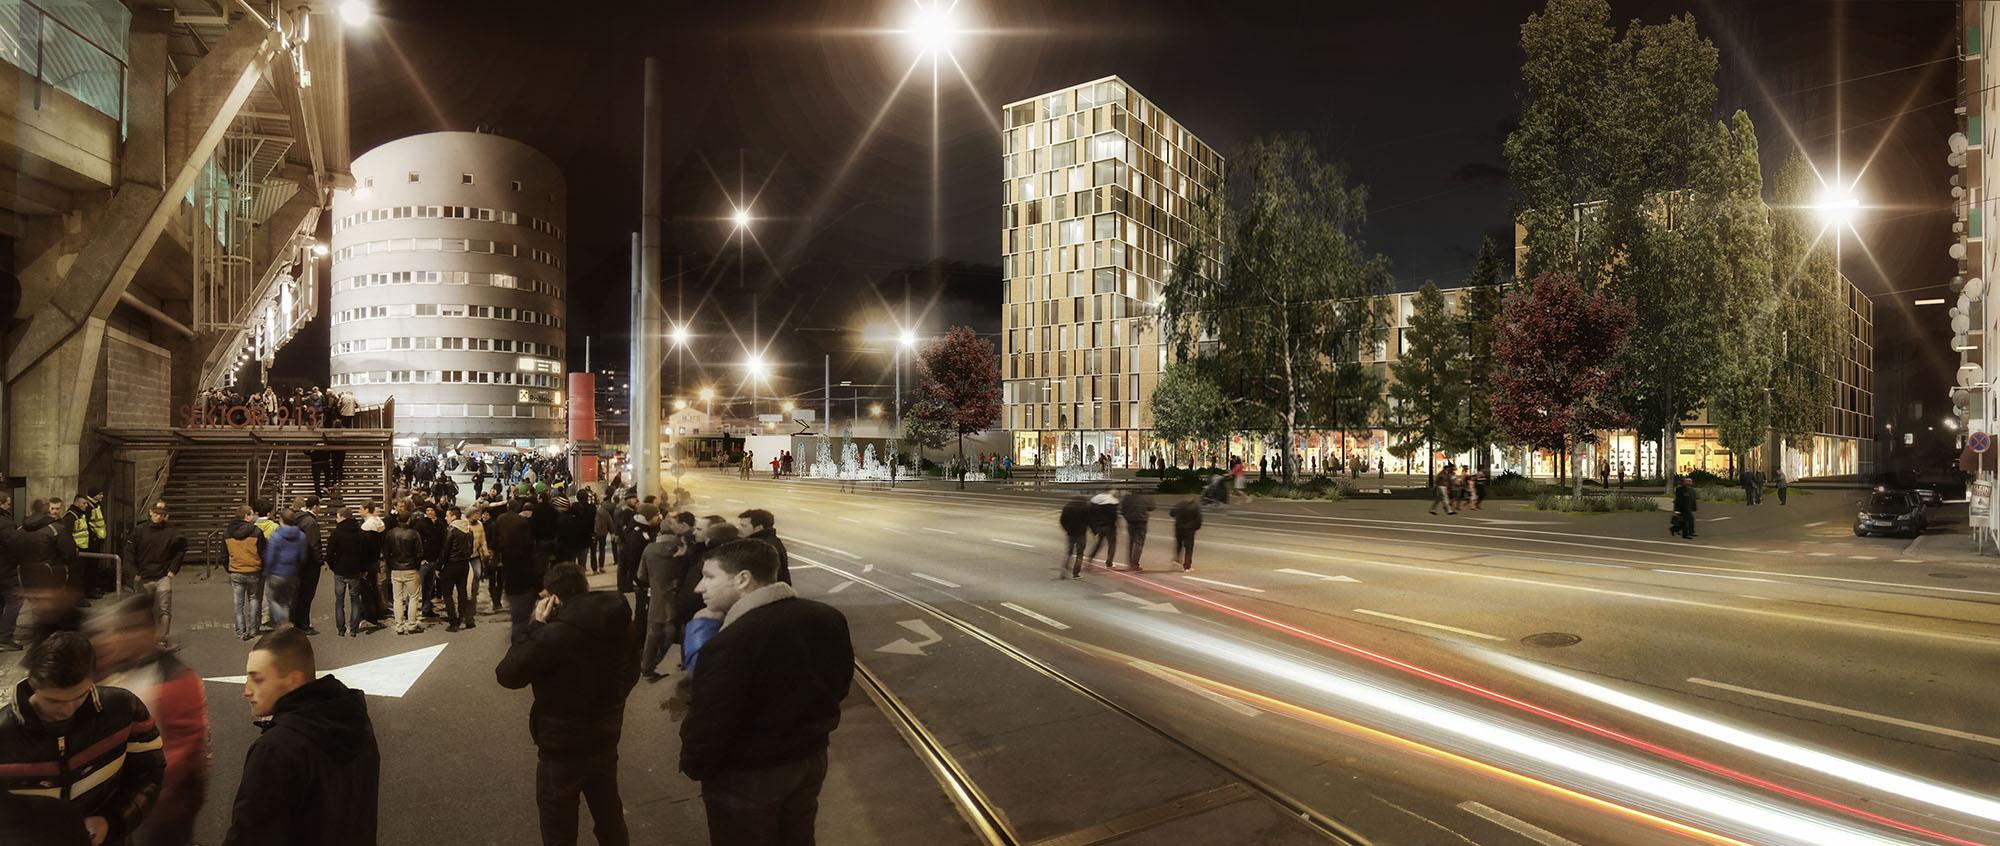 1. Preis Wettbewerb City Gate Graz